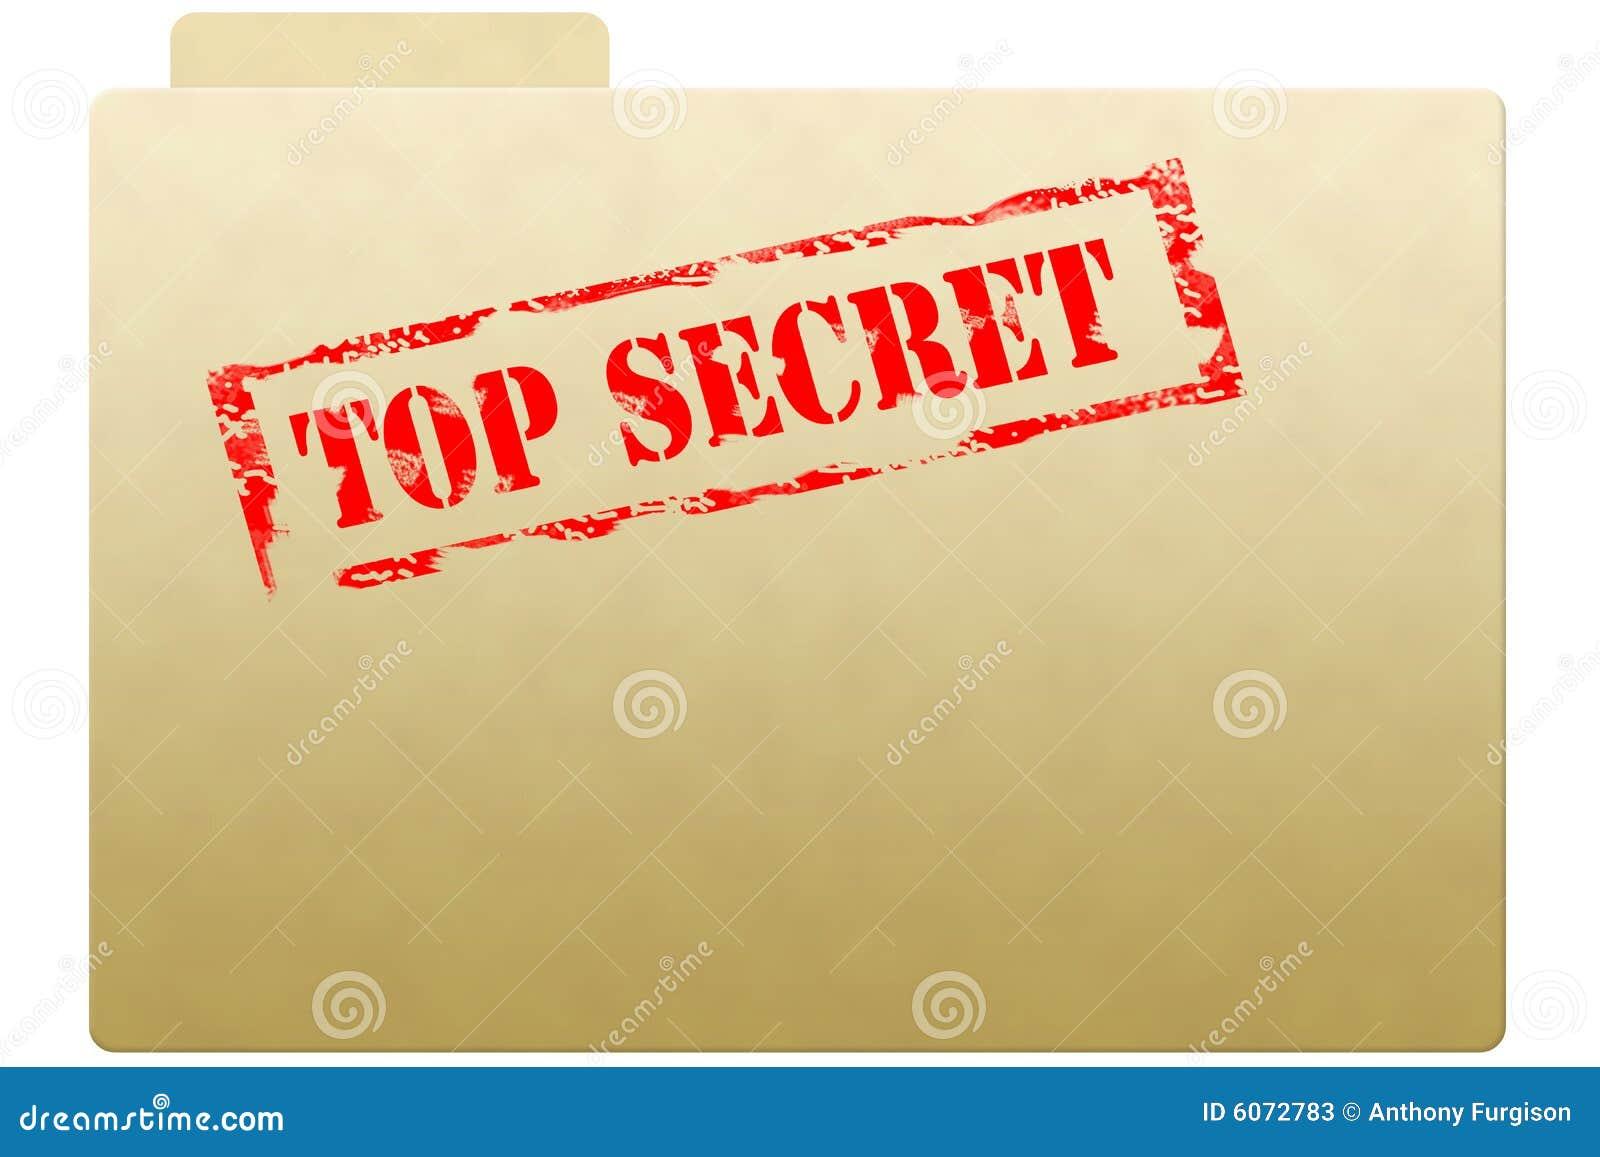 Secret video 1080p pic 97